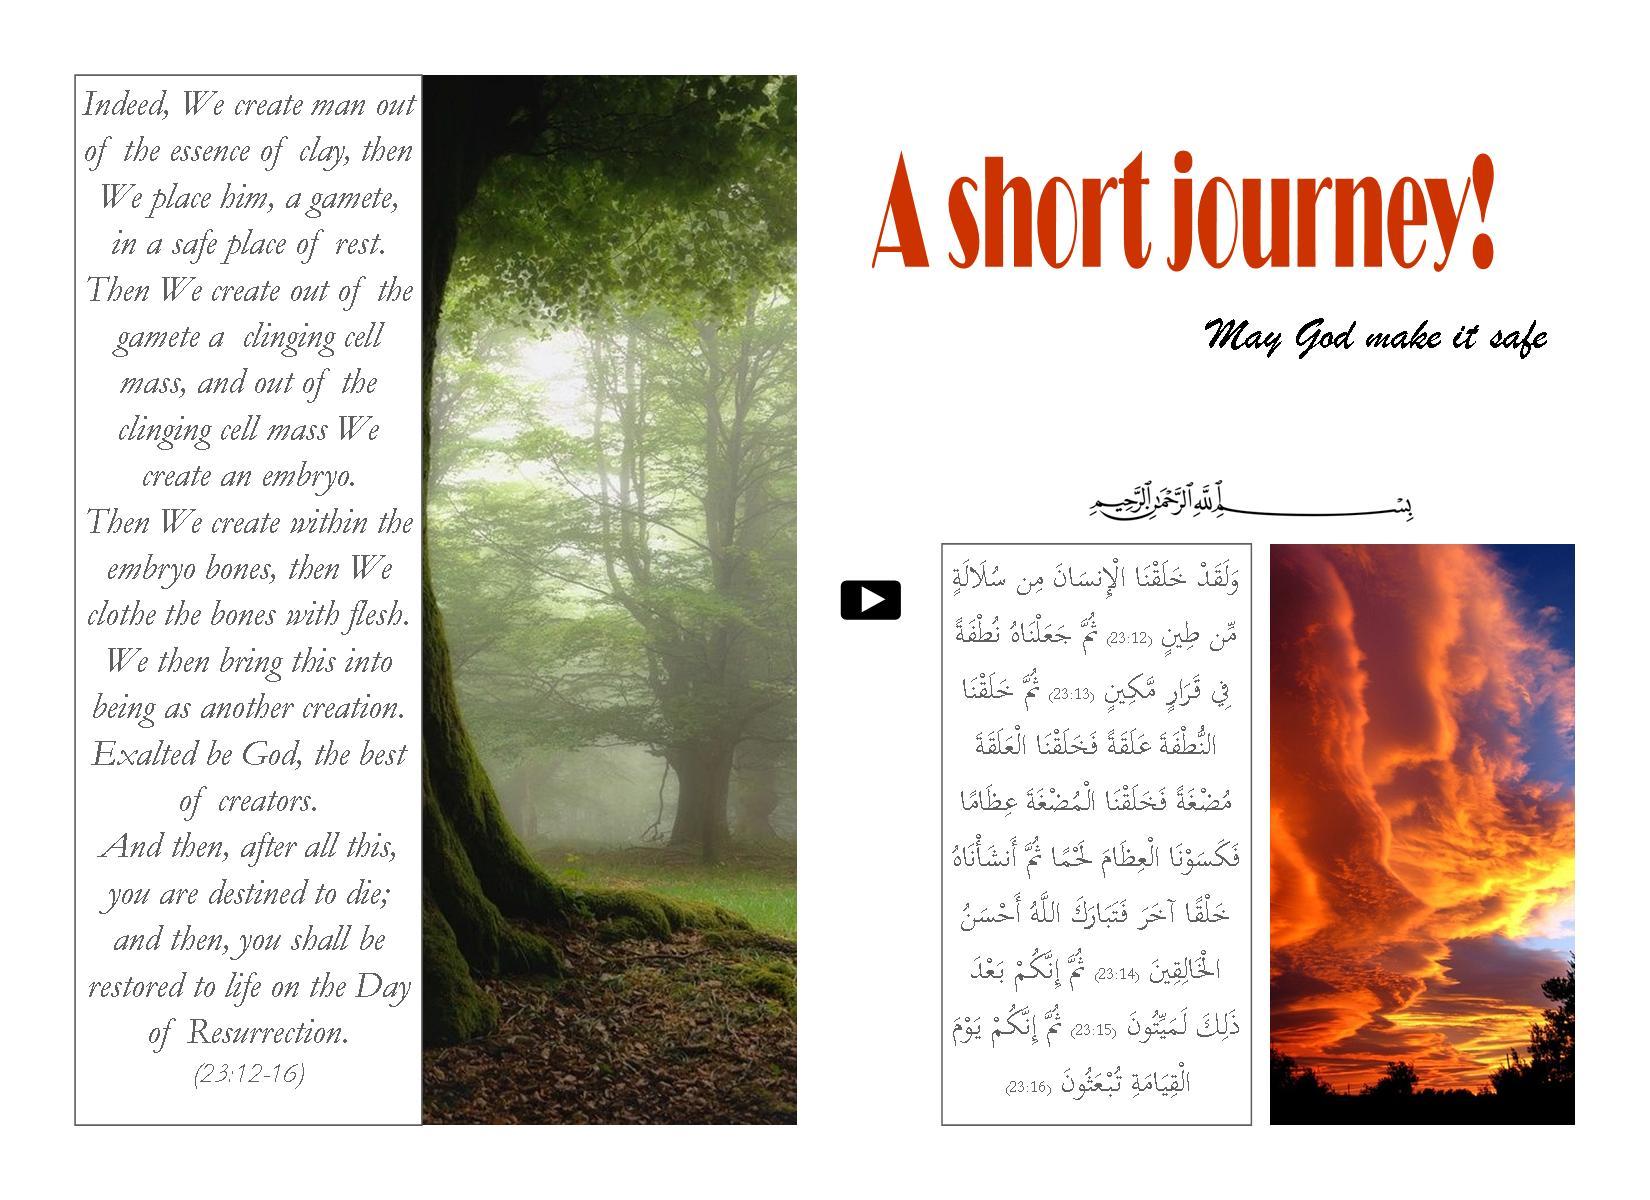 A short journey!